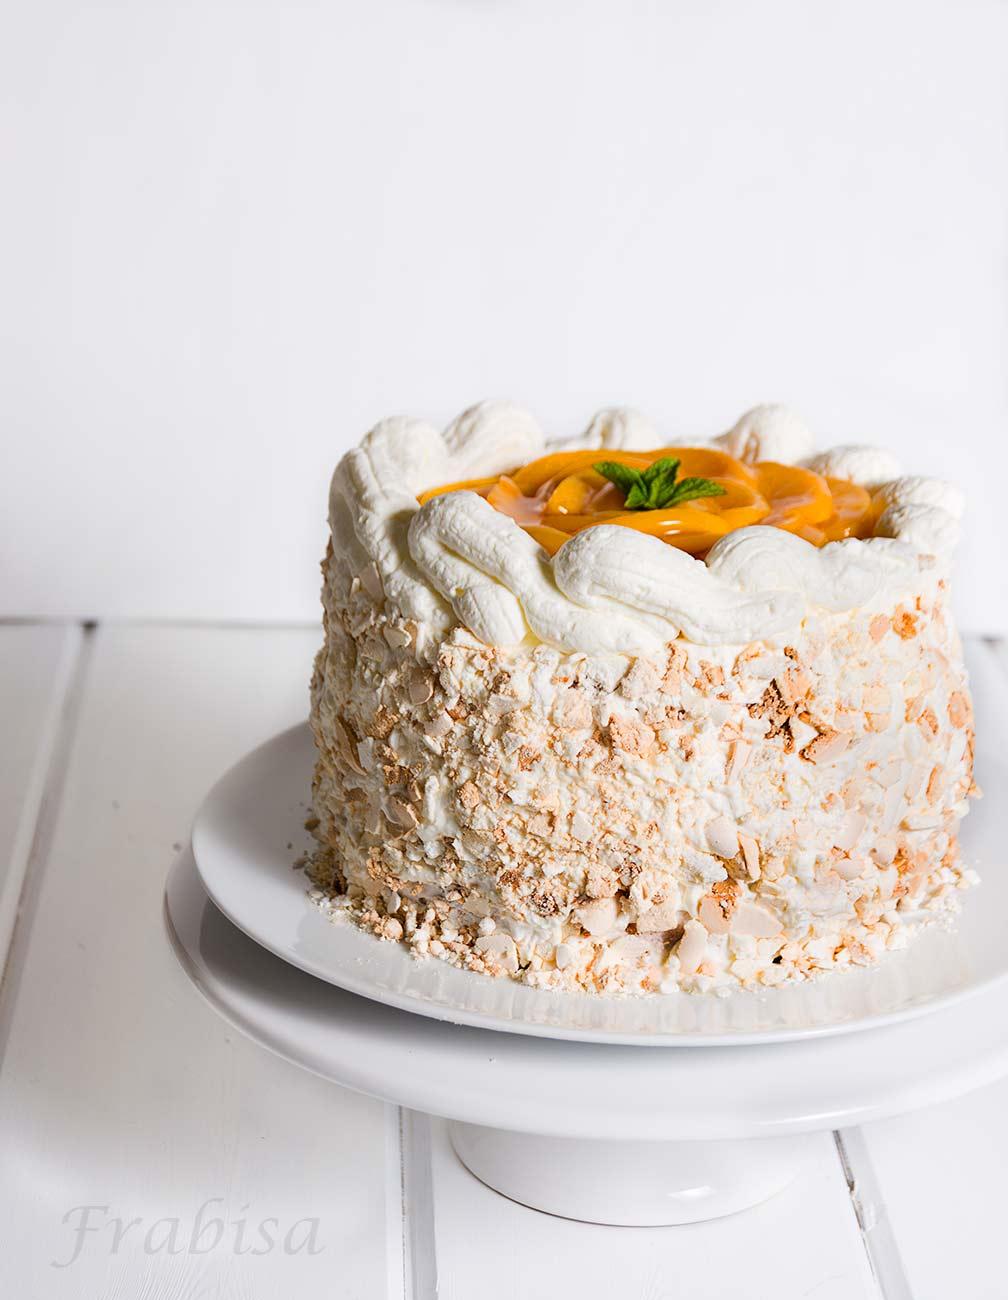 Layer Cake, Postre Chaja, Cuisine companion Moulinex, merengue, melocotones, postre